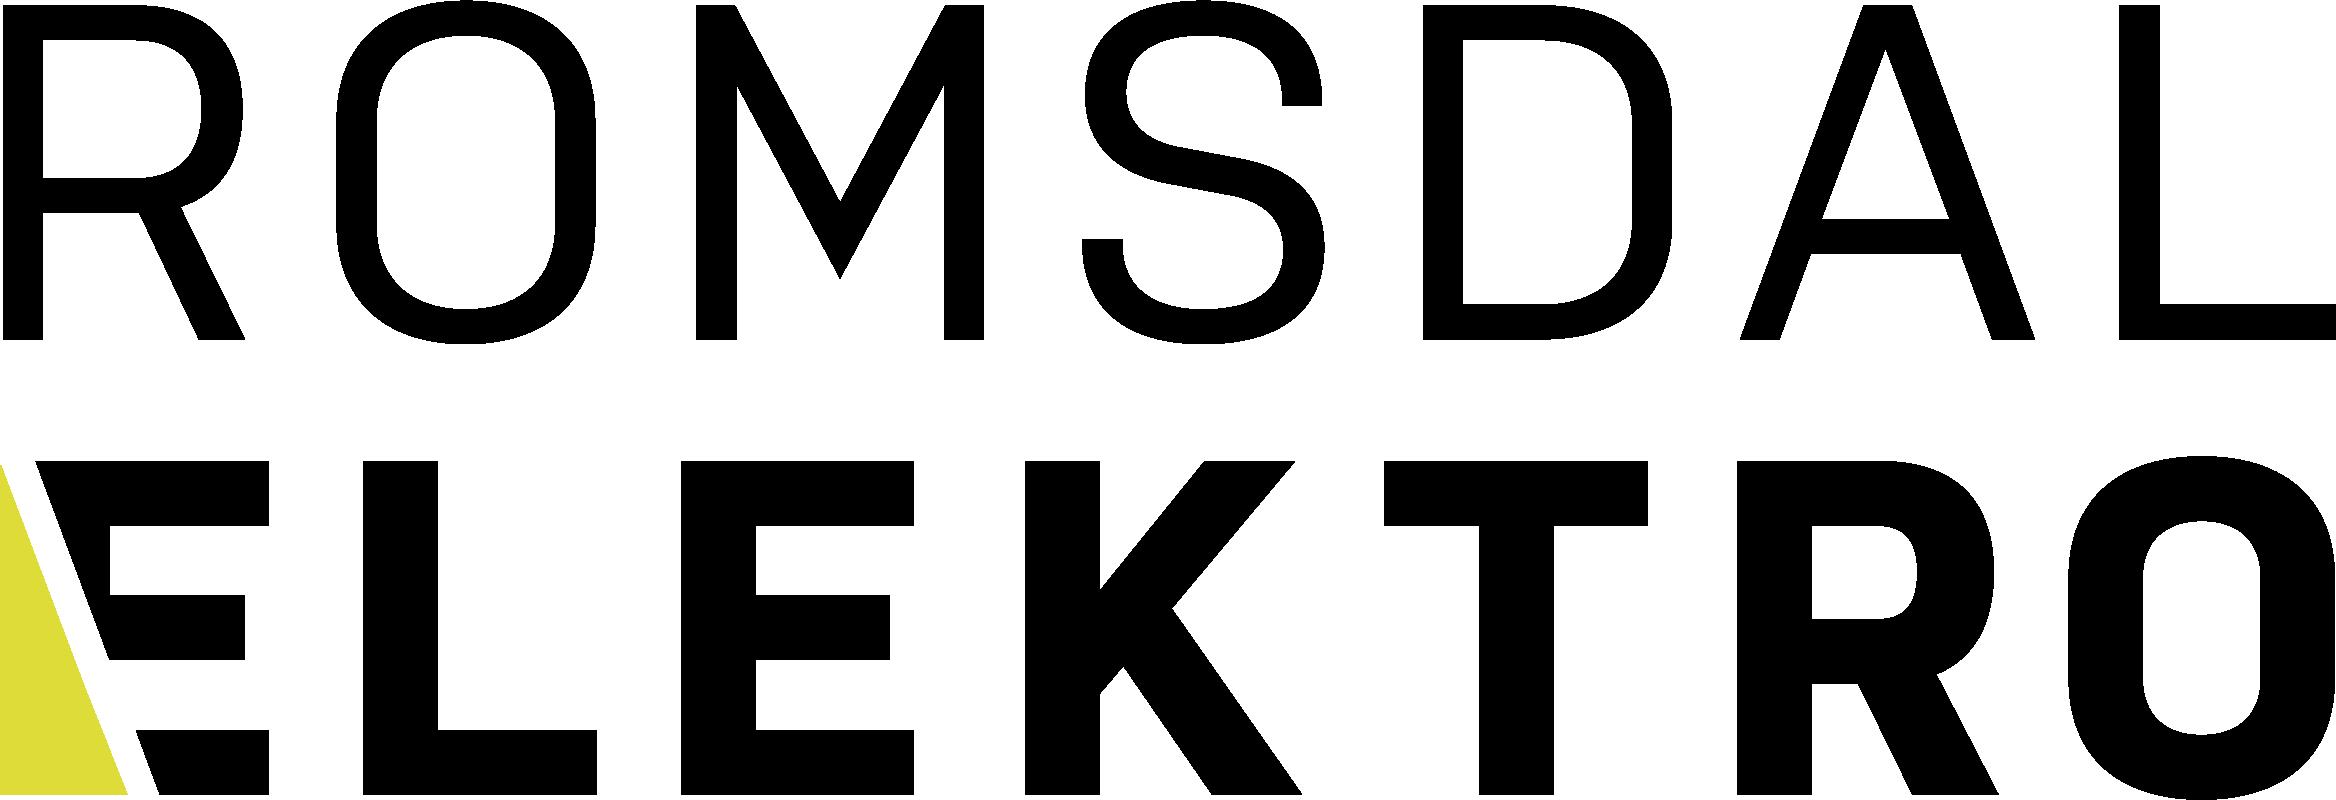 romsdal-elektro- Ladefabrikken